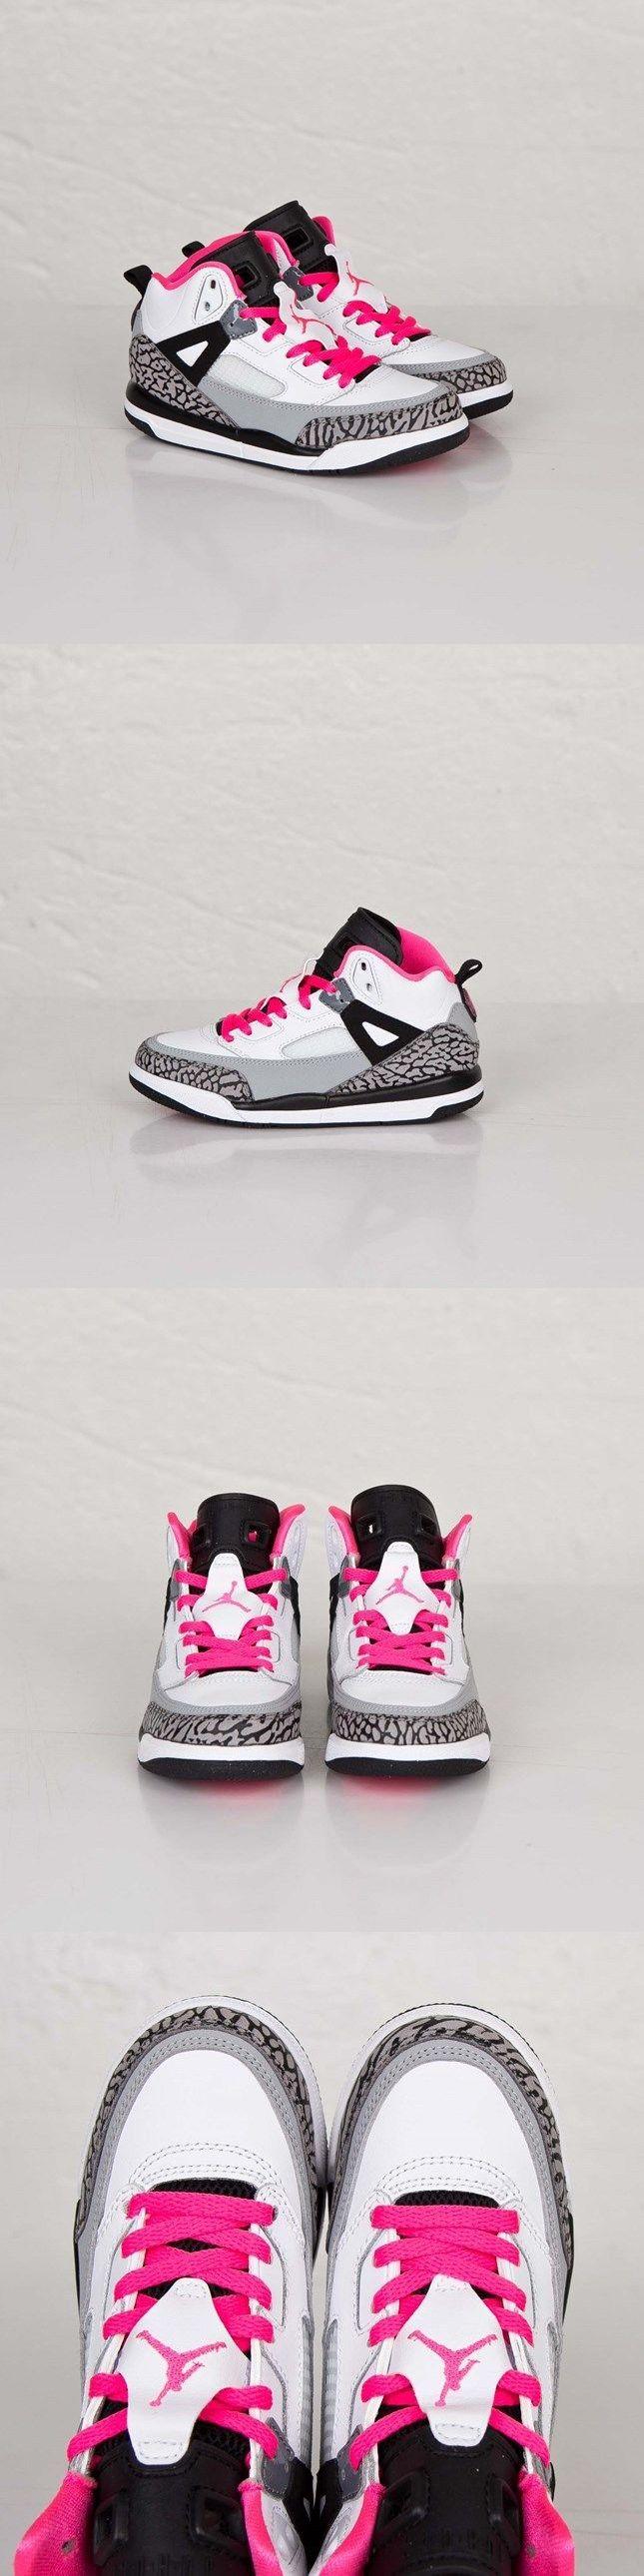 Youth 158973: Brand New Girls Jordan Spizike Gp 535708-109 Black/White-Grey Size 12C BUY IT NOW ONLY: $64.93